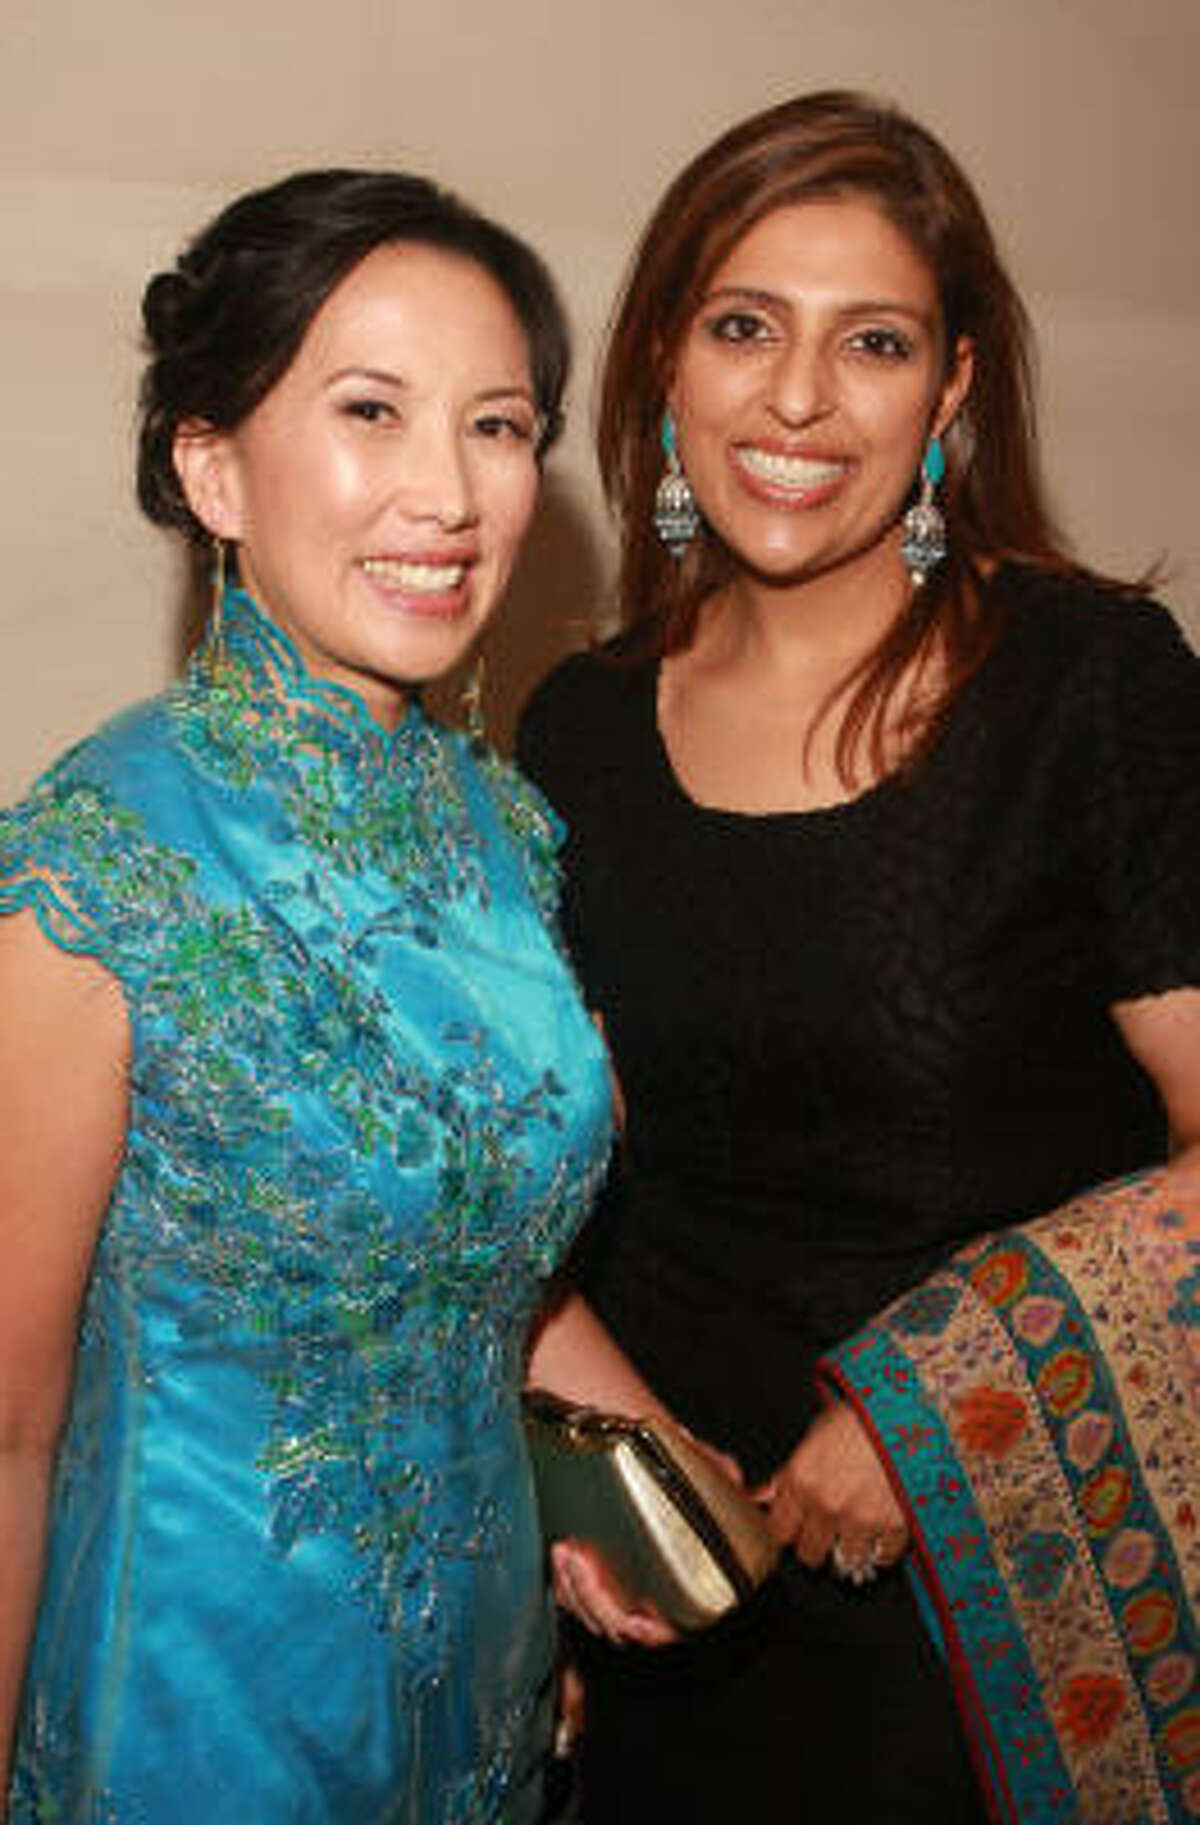 Christine Starkman, left, and Nidhika Mehta